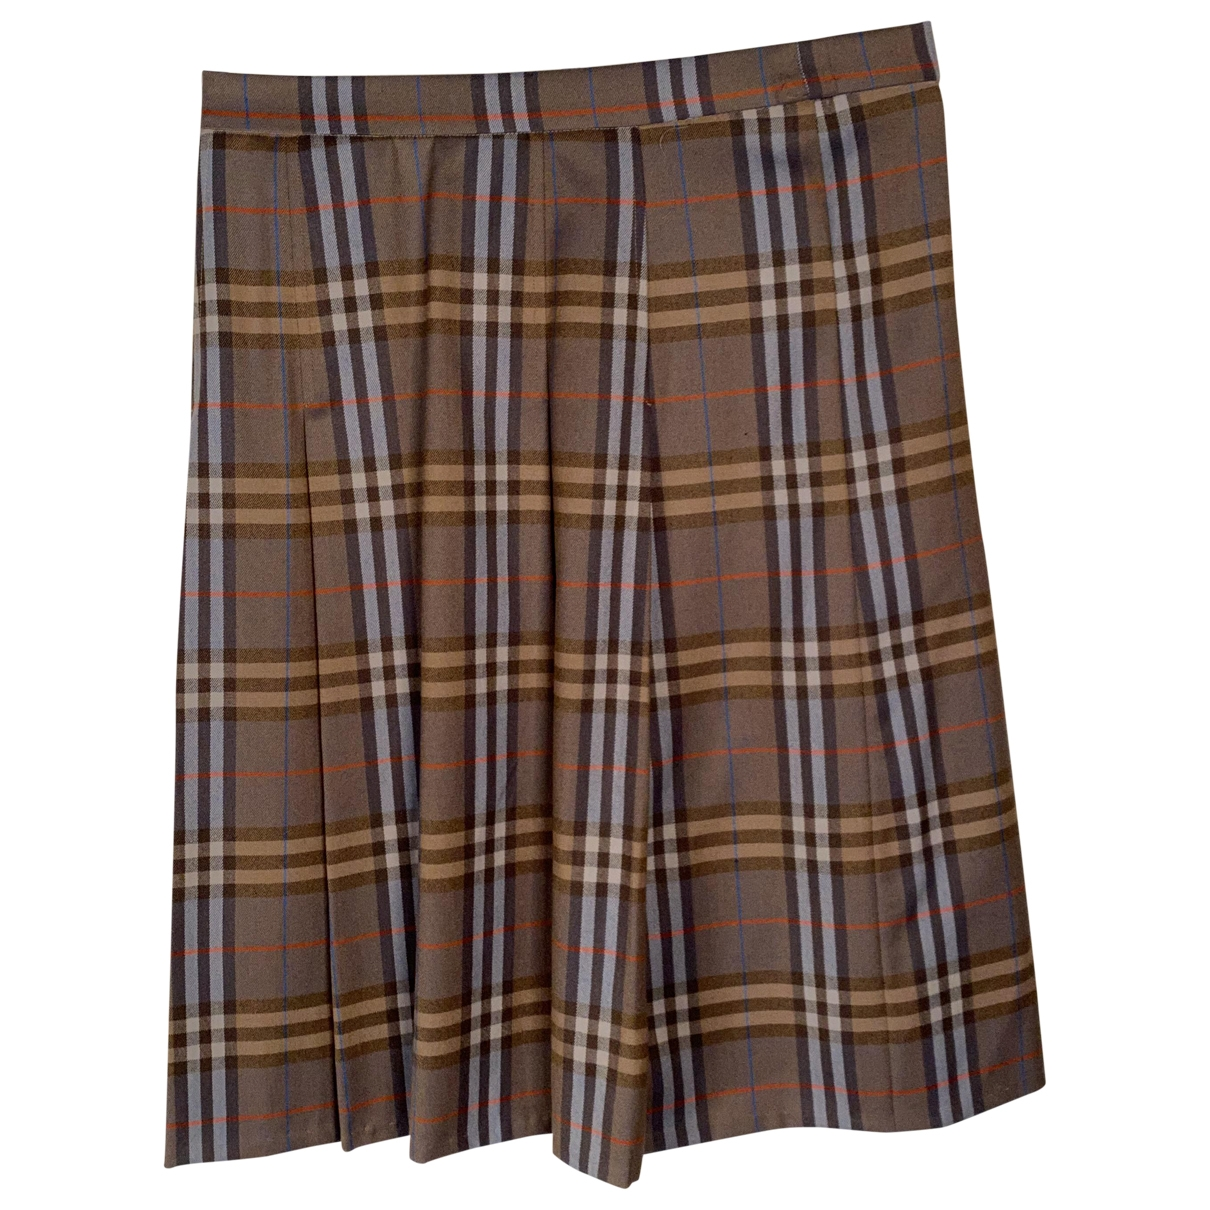 Burberry \N Beige Wool skirt for Women M International